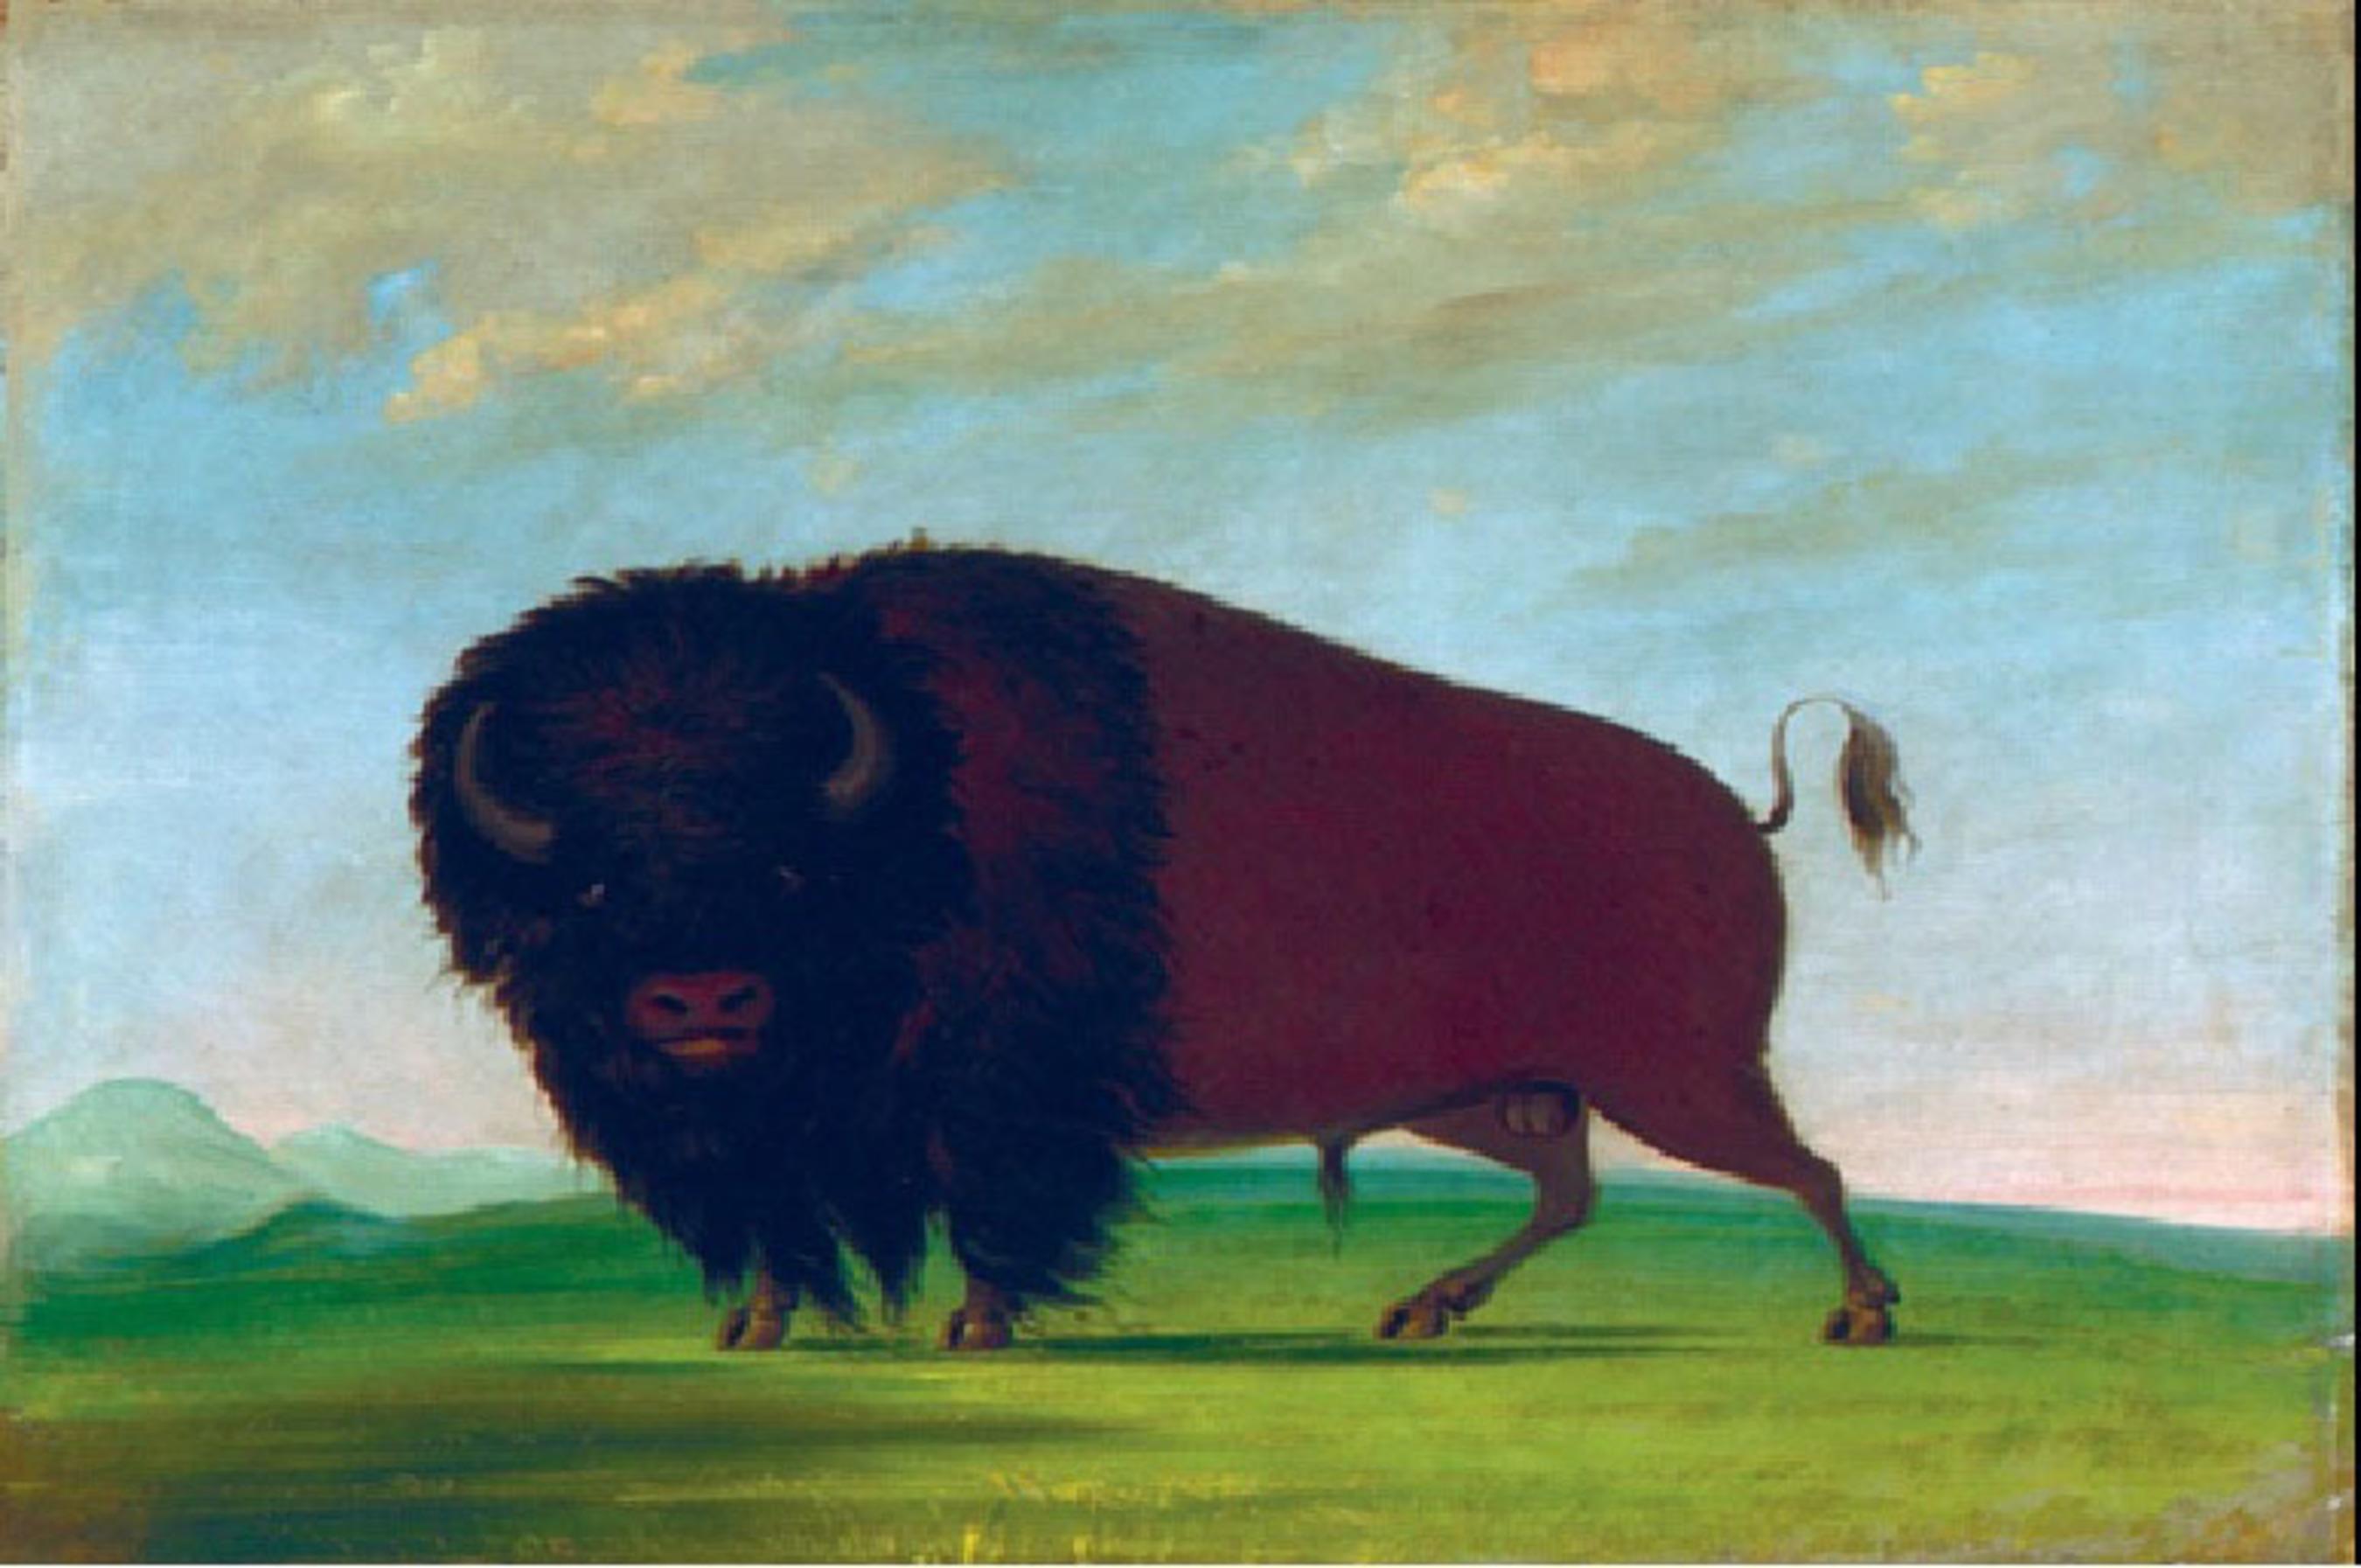 George Catlin, Buffalo Bull, Grazing on the Prairie, 1832-1833, oil on canvas, Smithsonian American Art Museum, Gift of Mrs. Joseph Harrison, Jr.  (PRNewsFoto/National Museum of Wildlife)